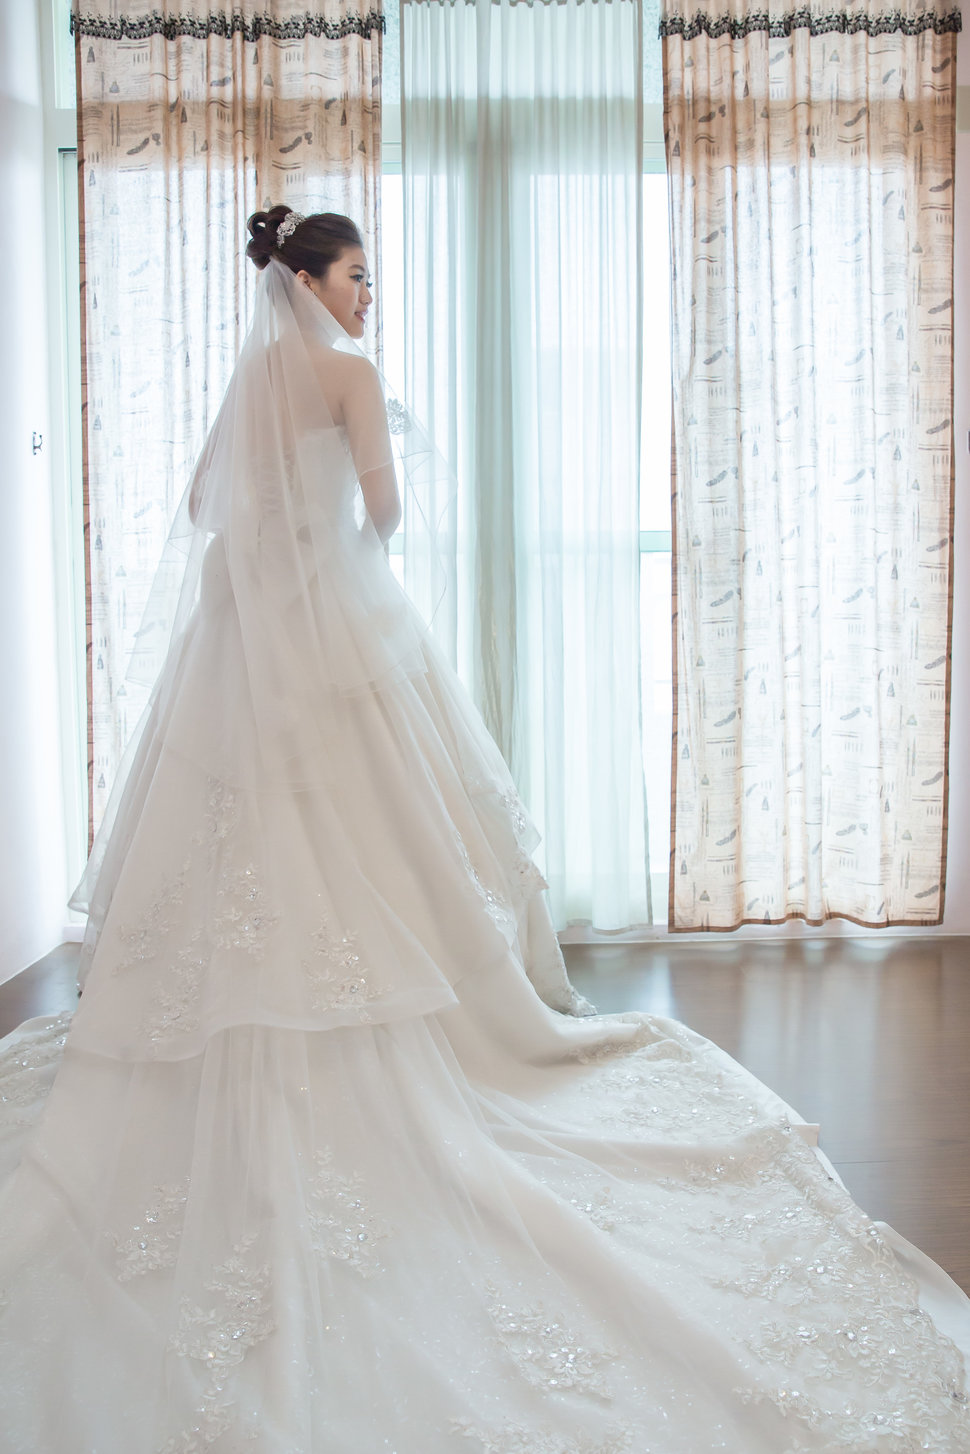 201612020213 - Loveliness ♥ wedding《結婚吧》